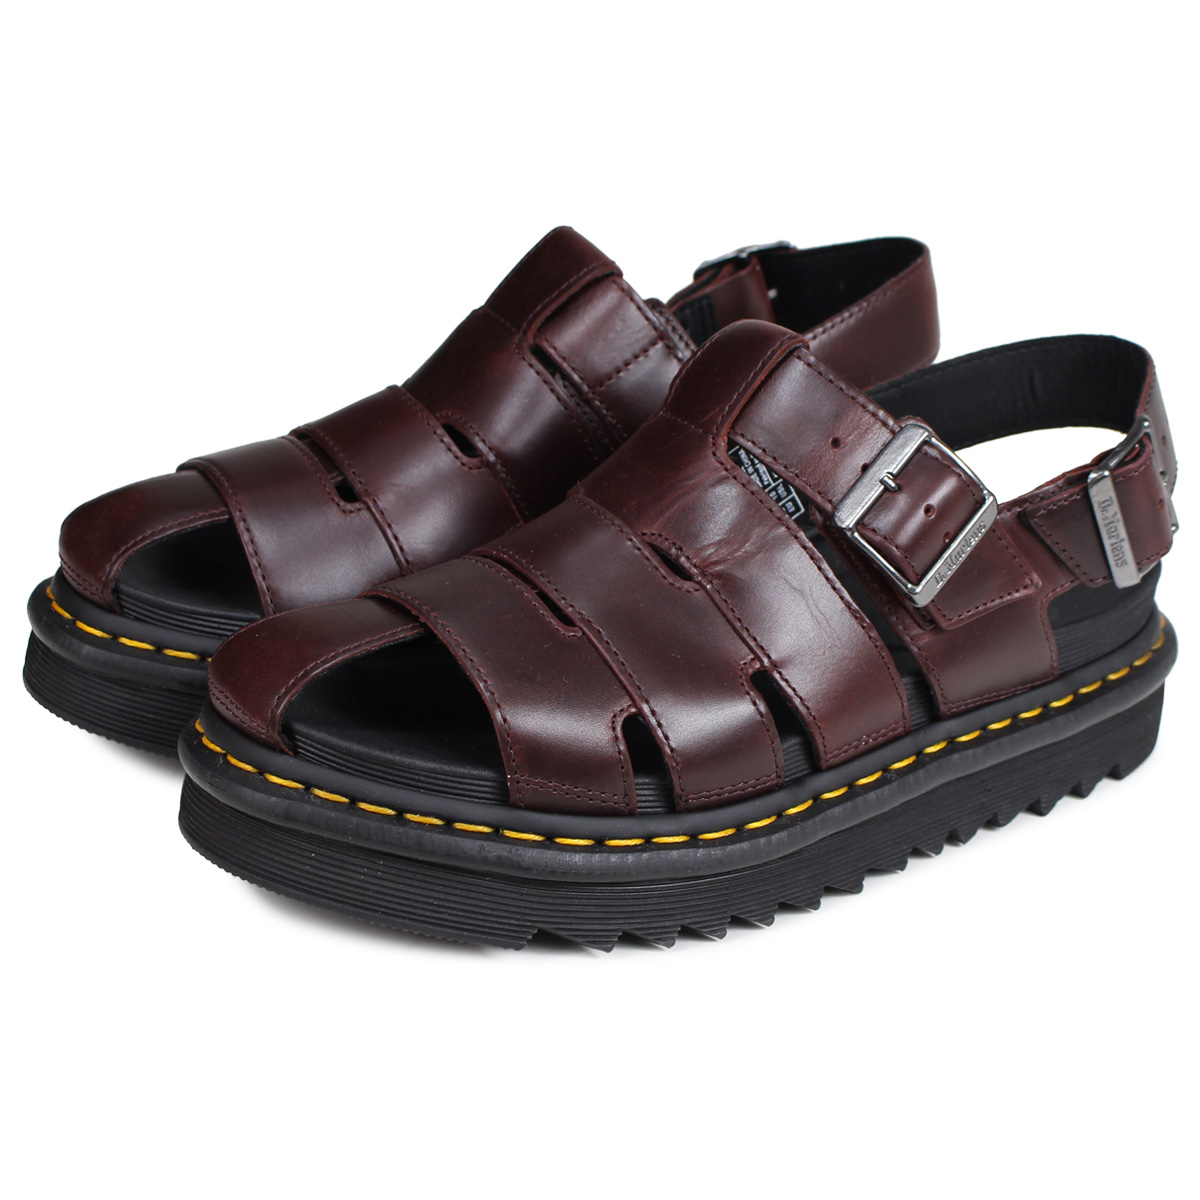 promo codes 100% genuine buy Dr.Martens ABEL doctor Martin sandals Abel fisherman men gap Dis brown  R24522211 [194]